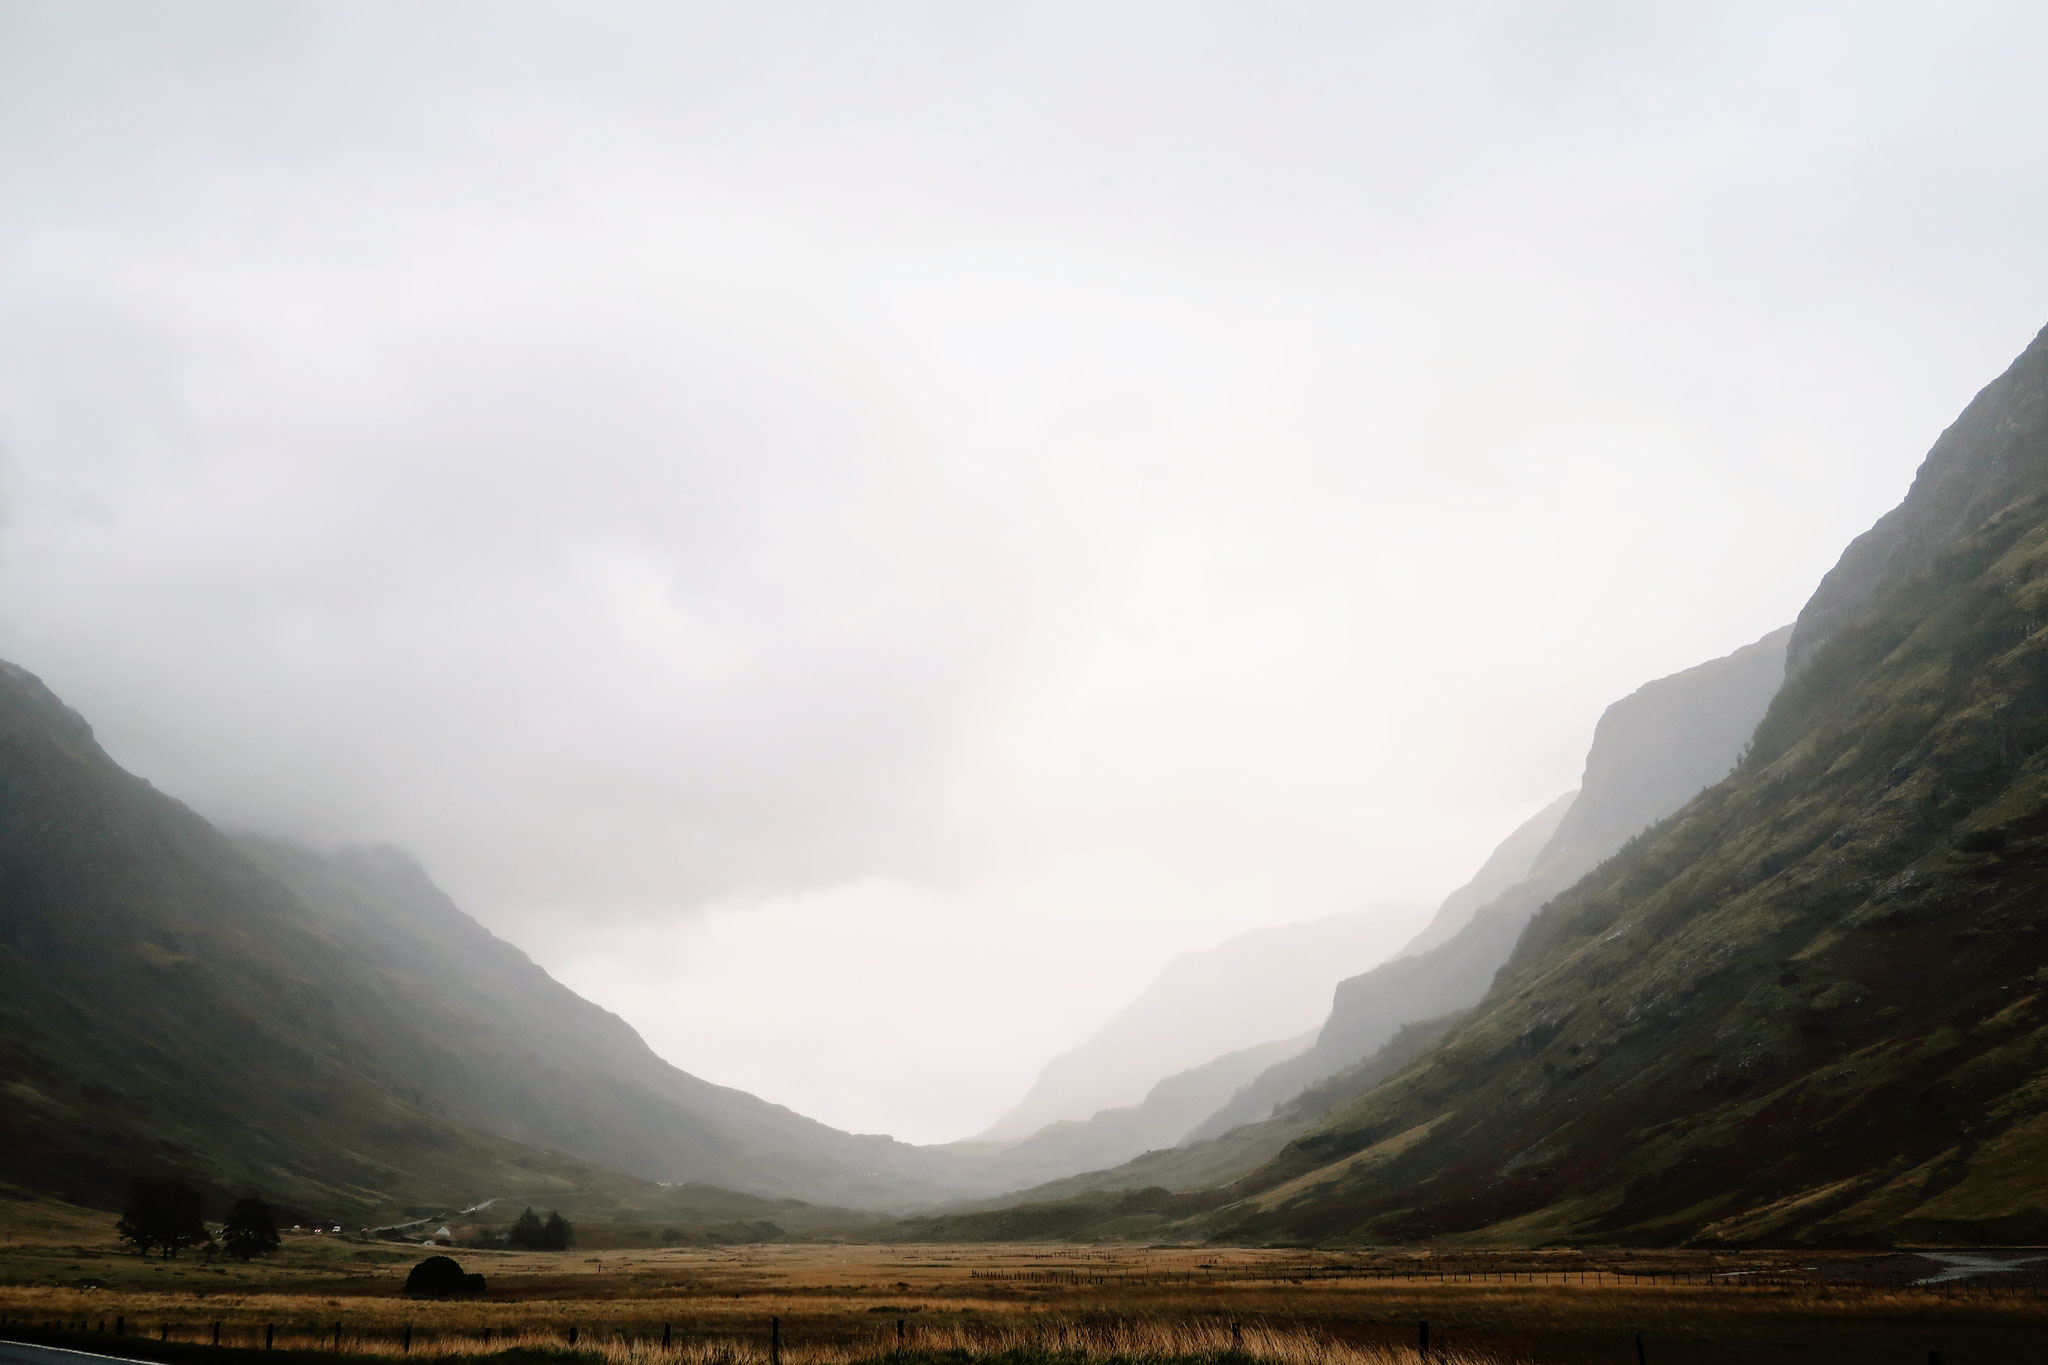 Glencoe Valley im Regen